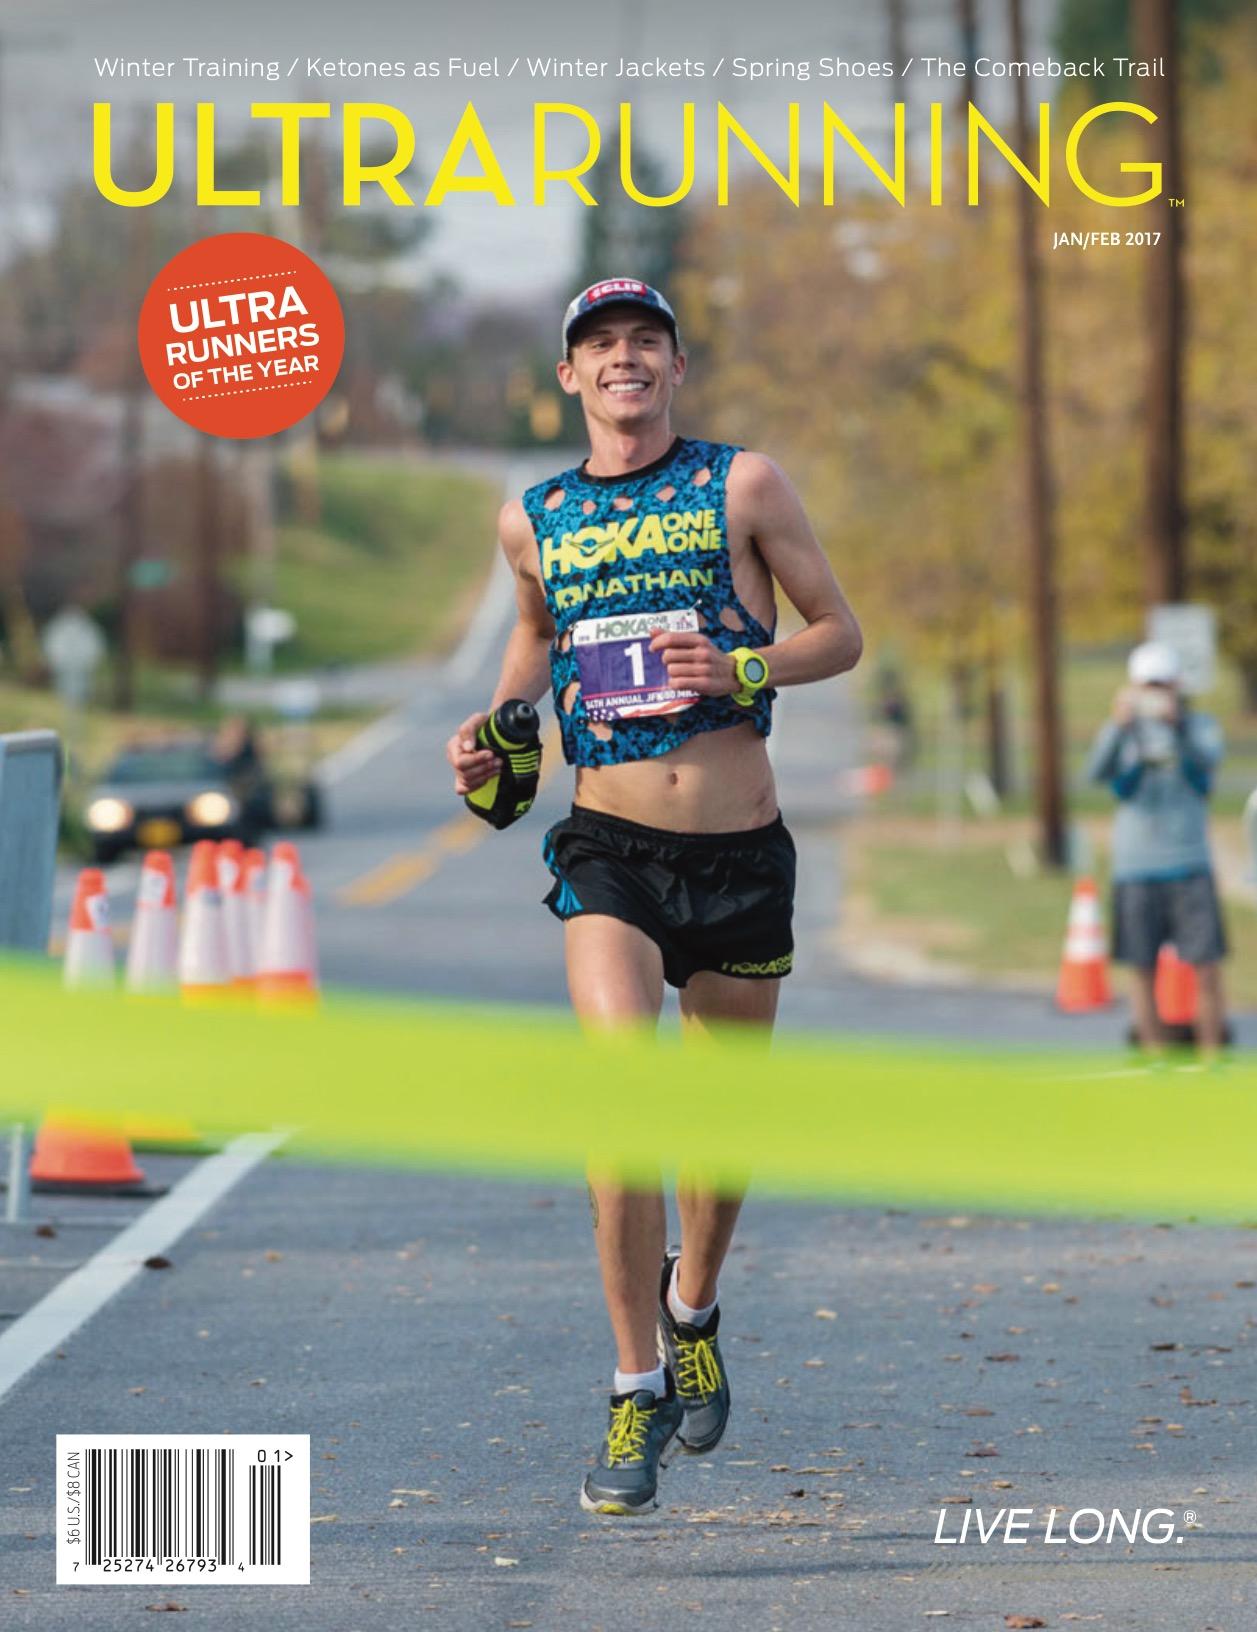 Ultramarathon News Podcasts: UltraRunning Jan/Feb 2017